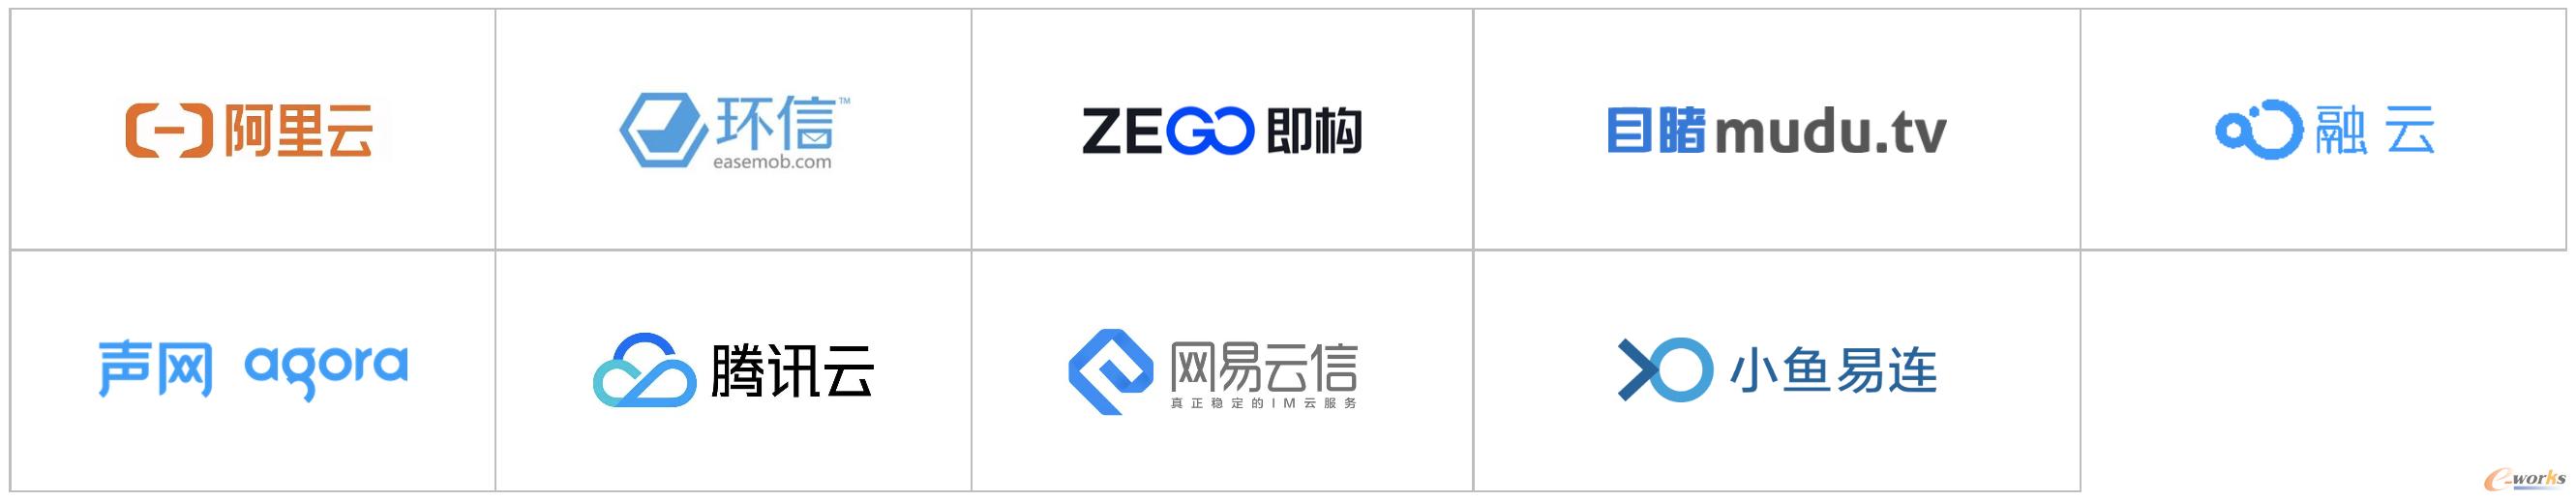 http://www.e-works.net.cn/News/articleimage/202012/132512929883450350_new.png